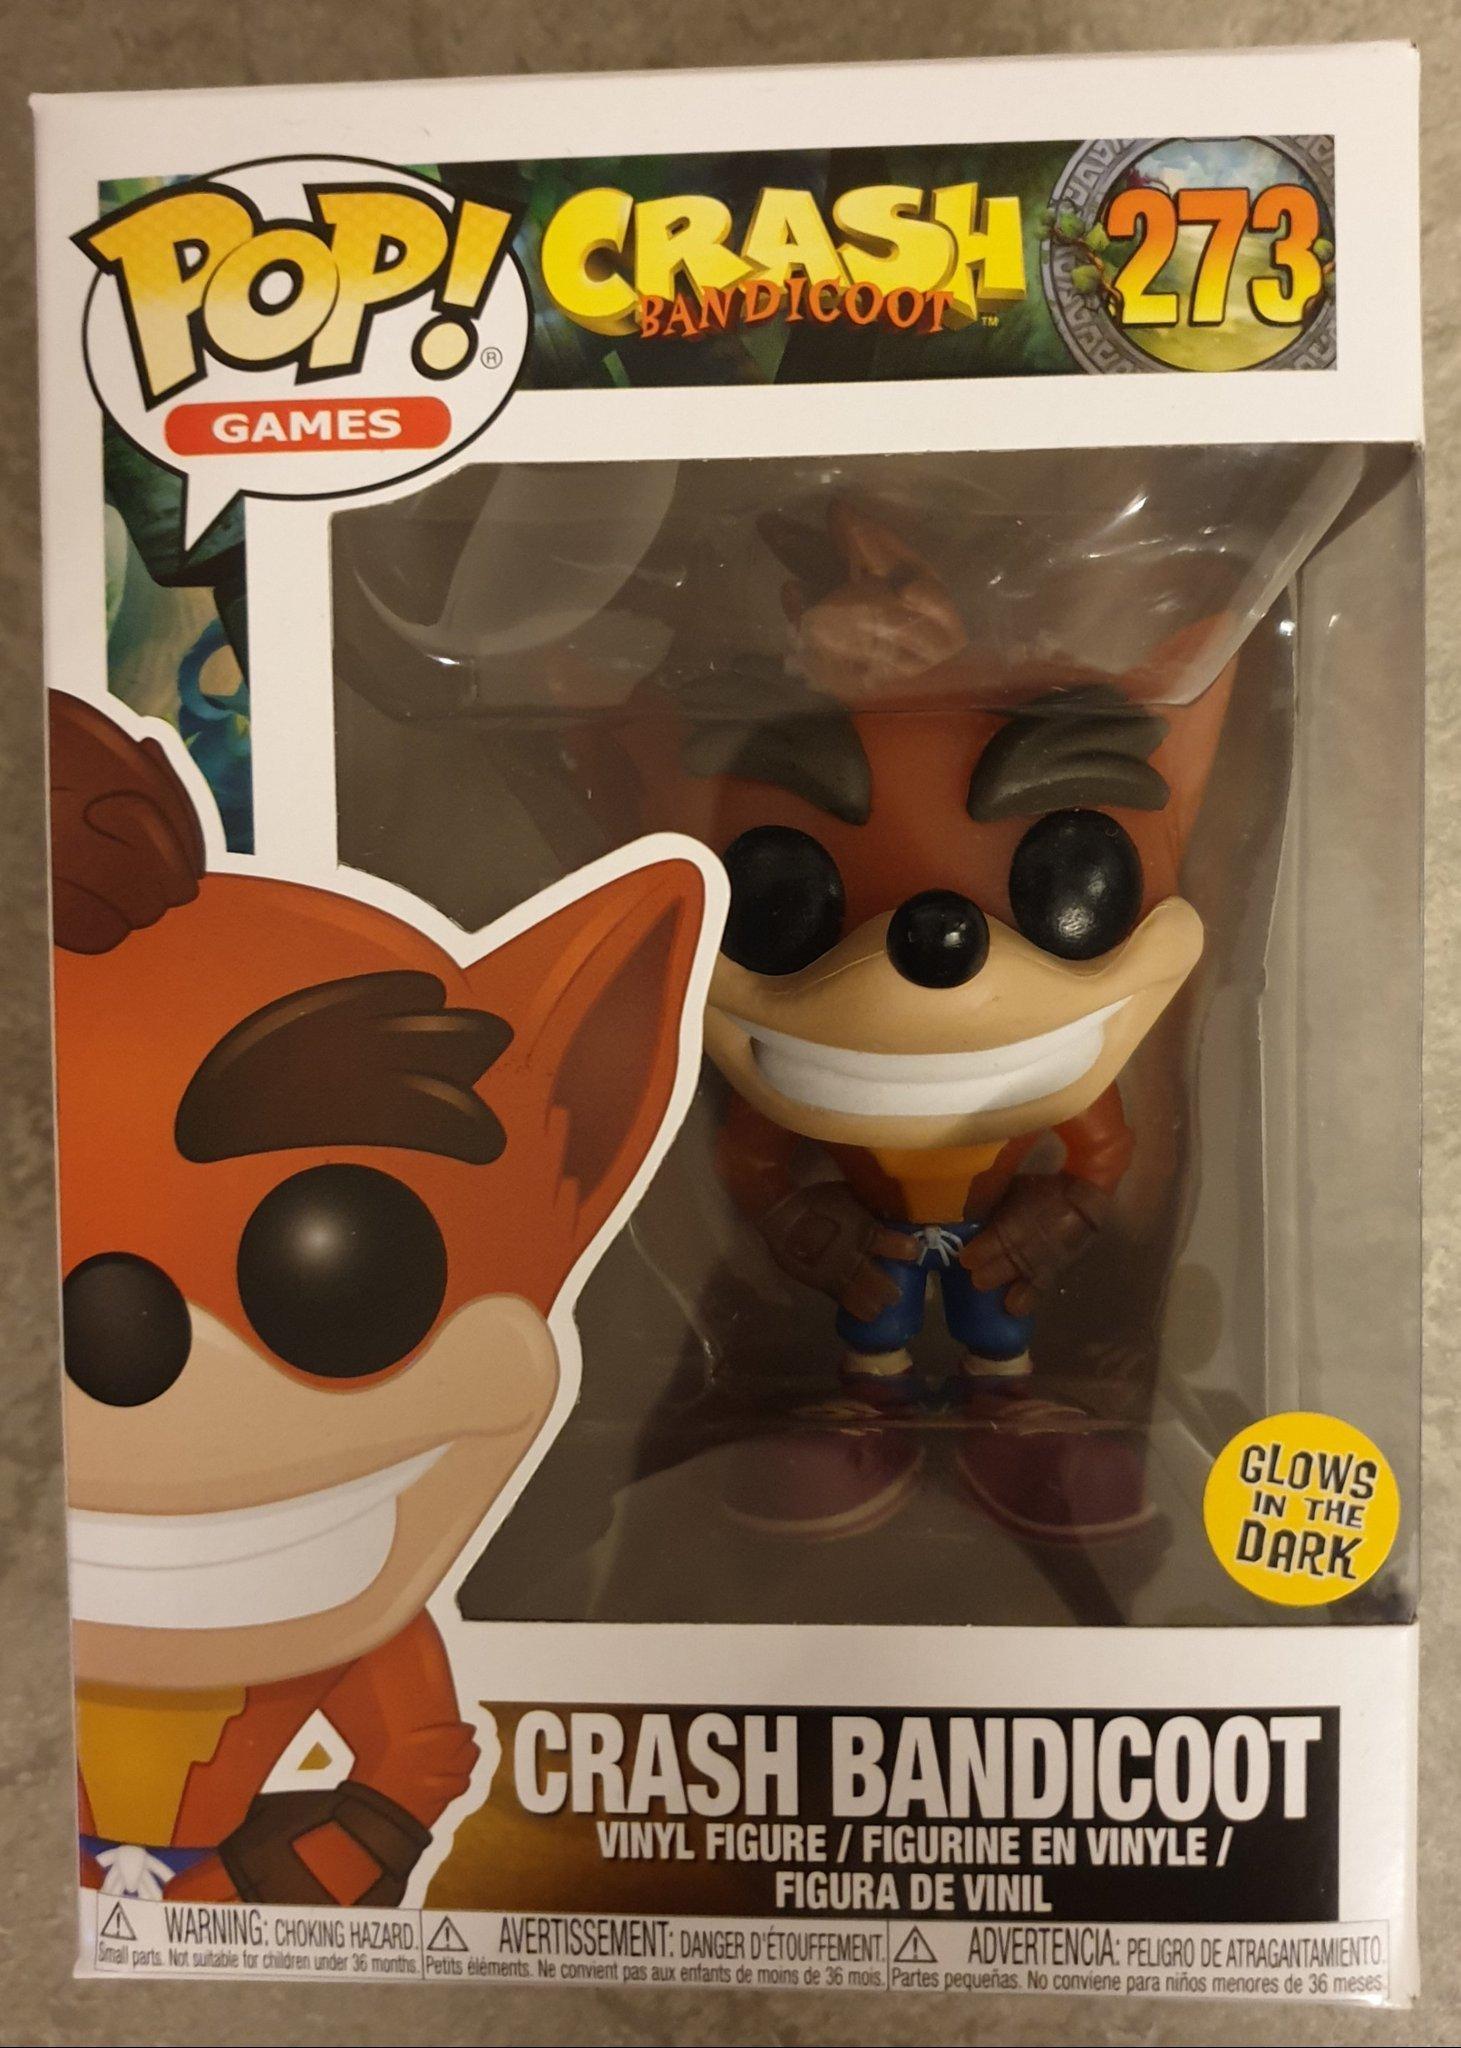 Games-Crash Bandicoot #273 Crash Bandicoot Pop glow in the dark